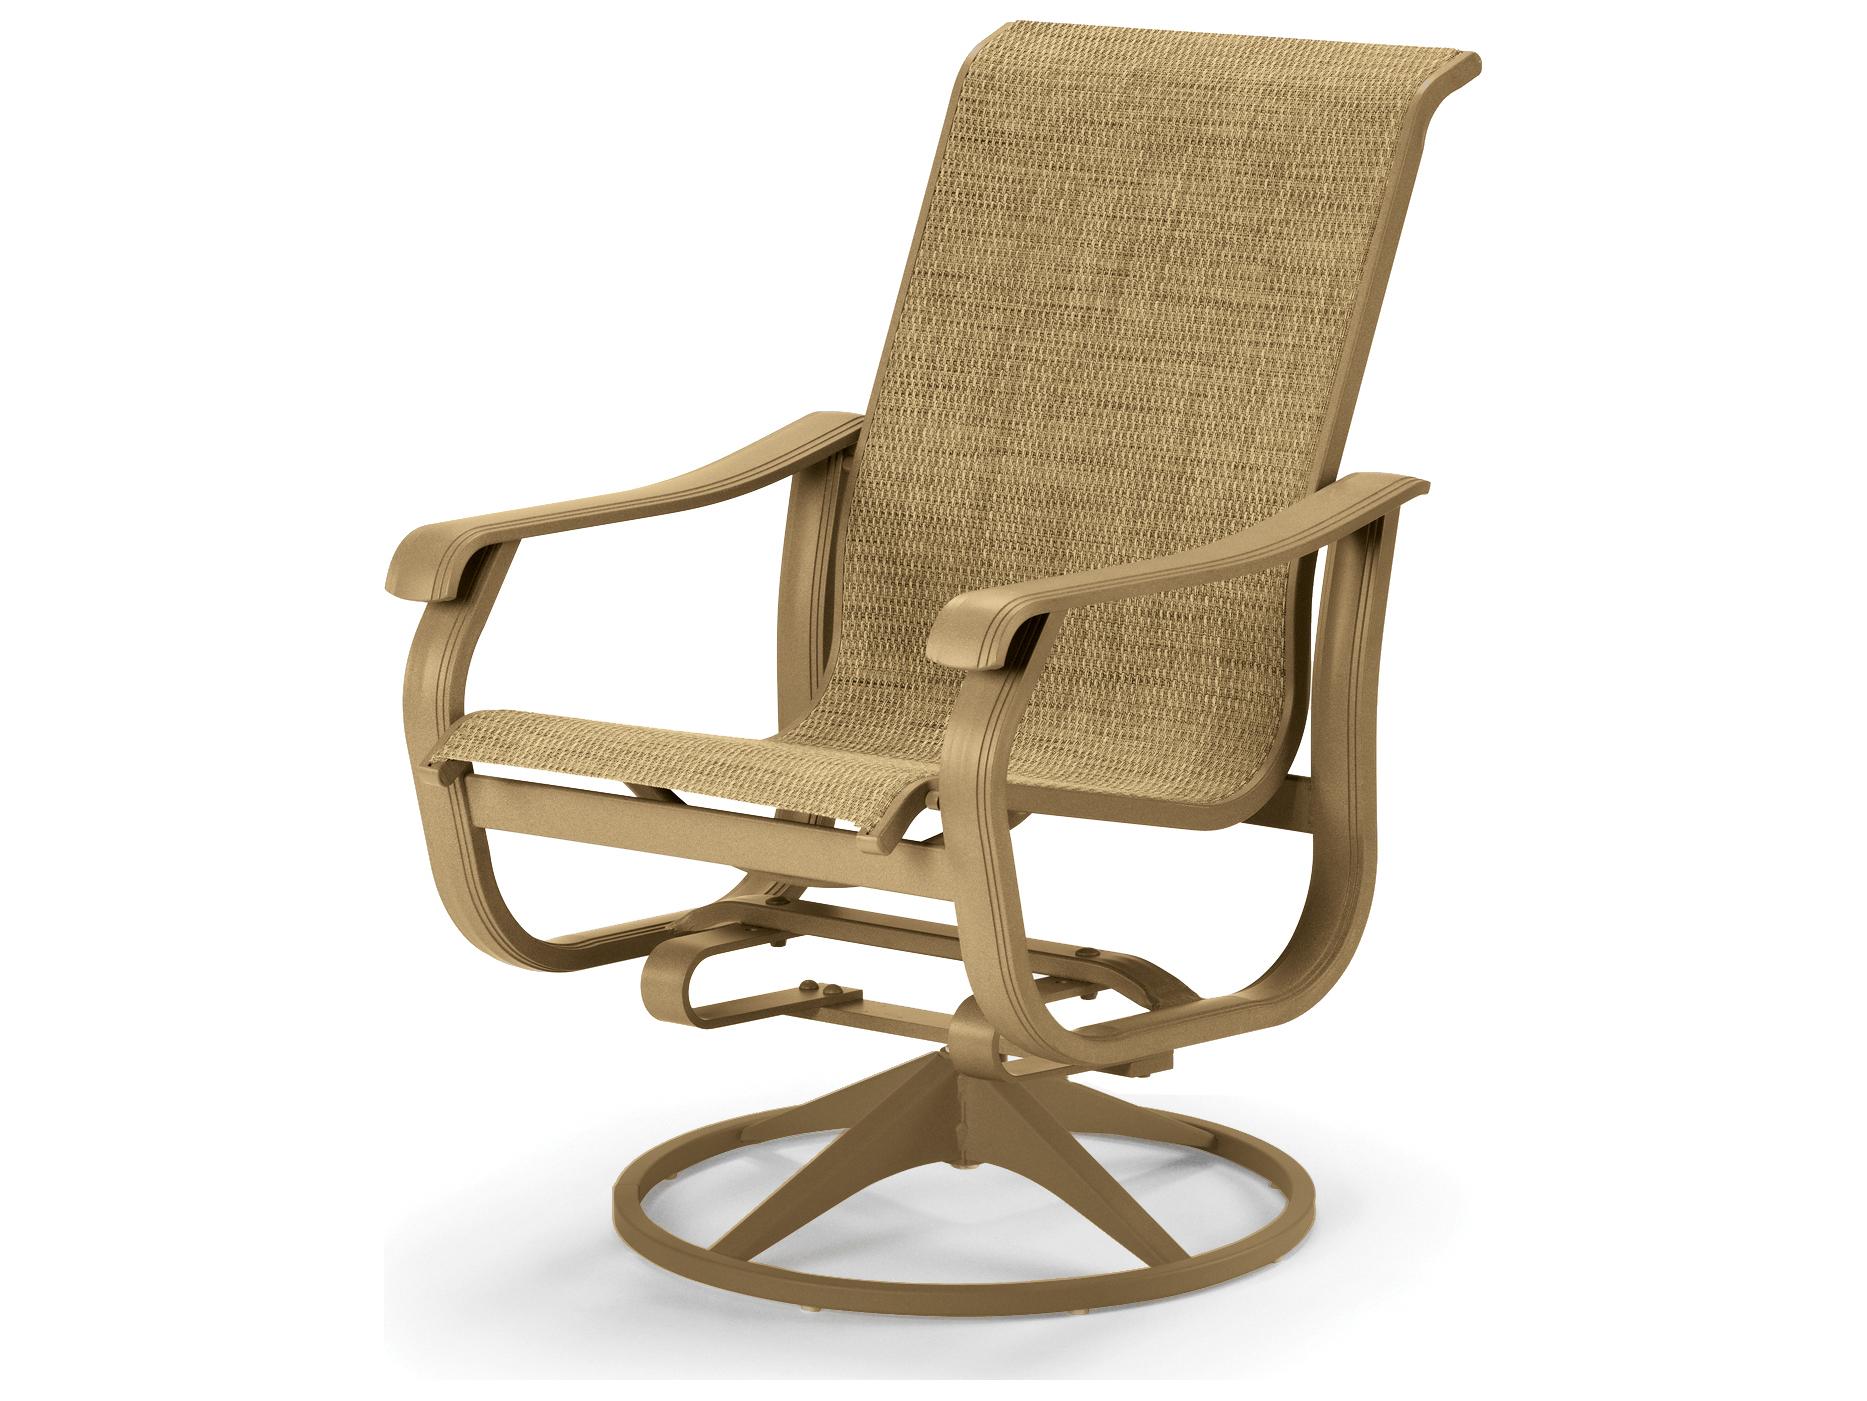 Telescope Casual Villa Sling Swivel Rocker Dining Chair